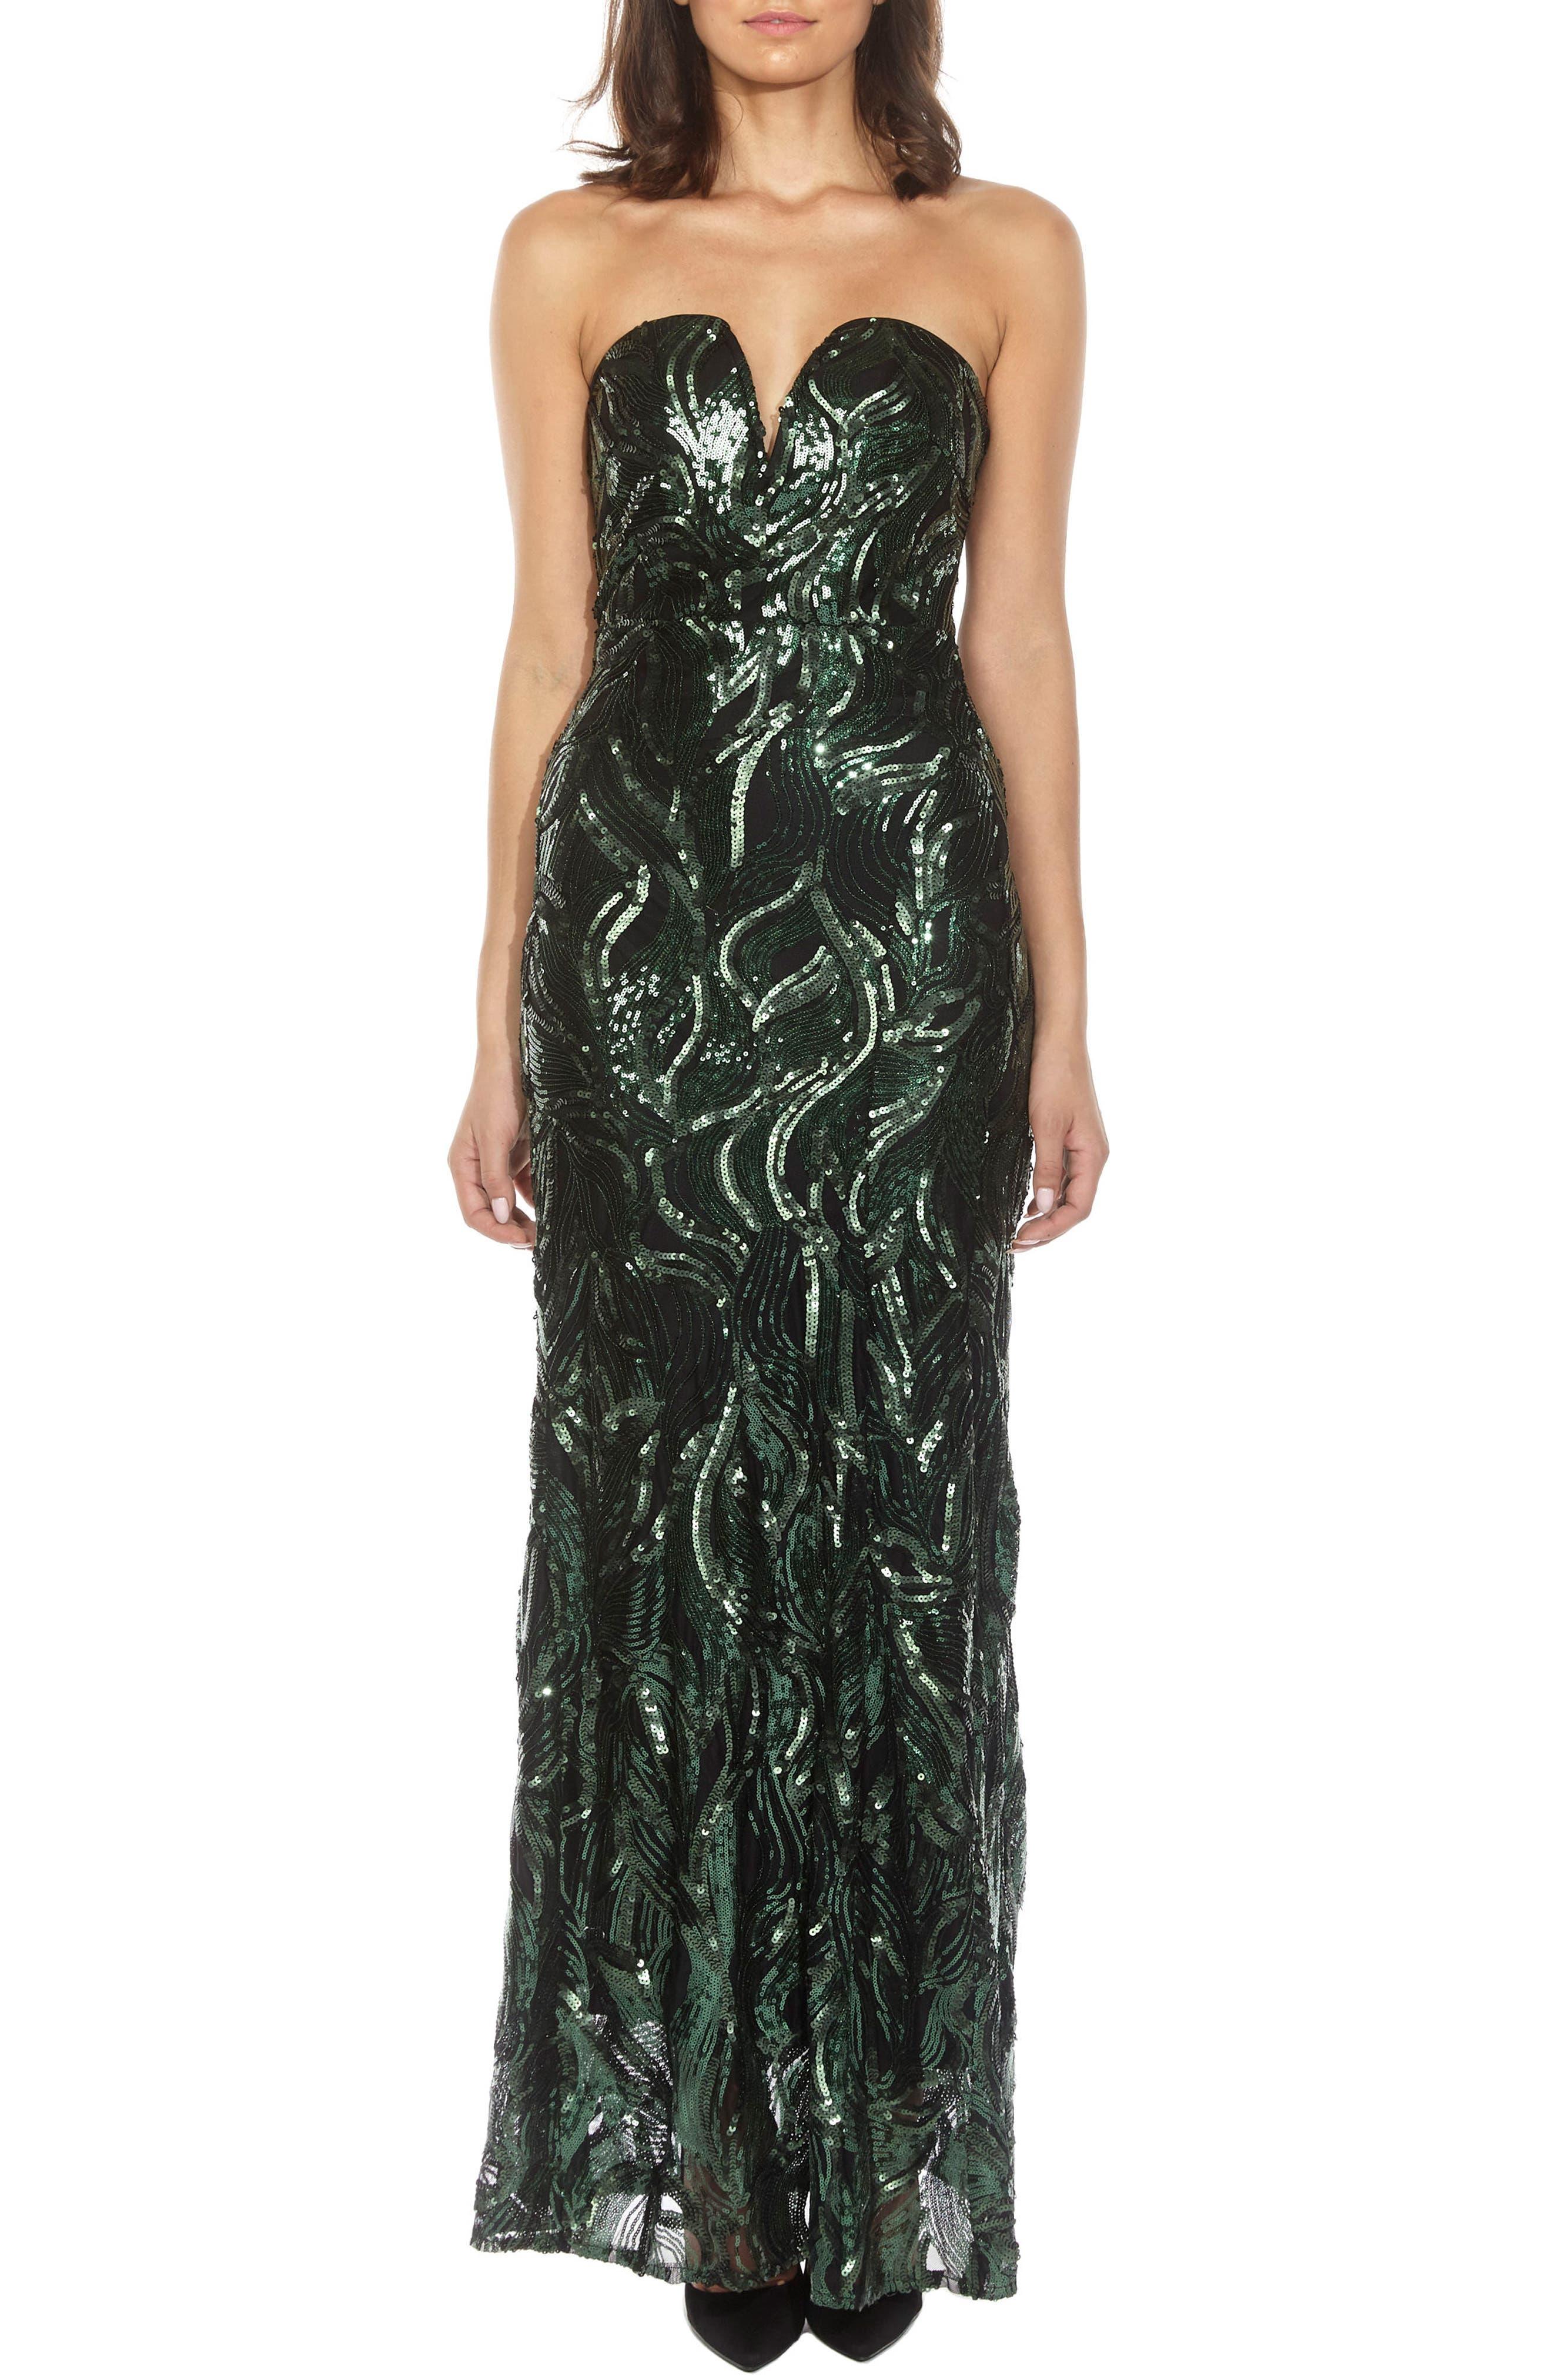 Gaynor Sequin Strapless Maxi Dress,                             Main thumbnail 1, color,                             310